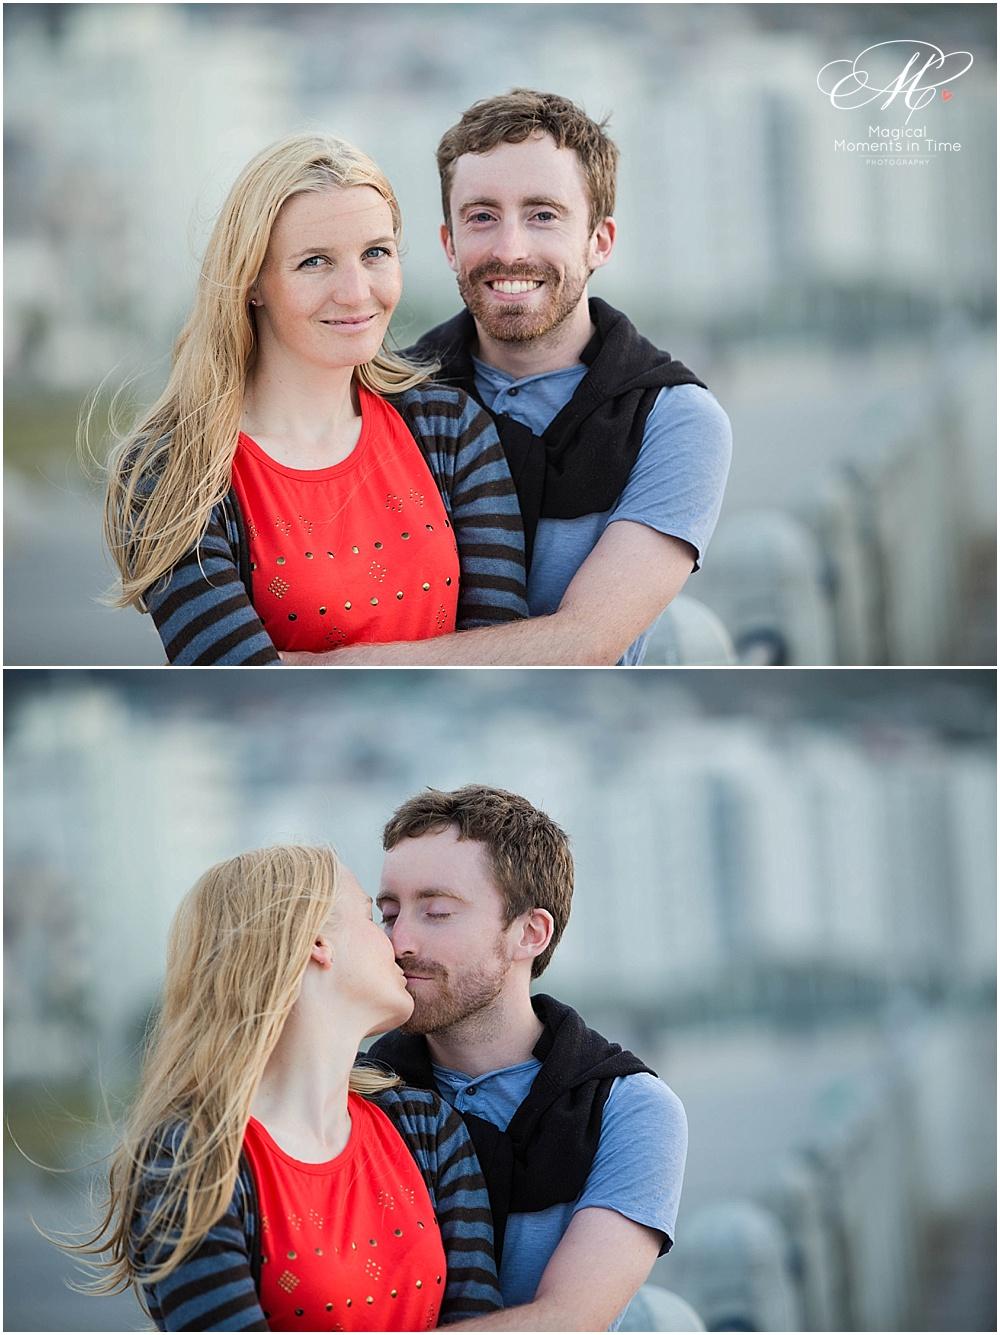 cape town engagement photography couple love